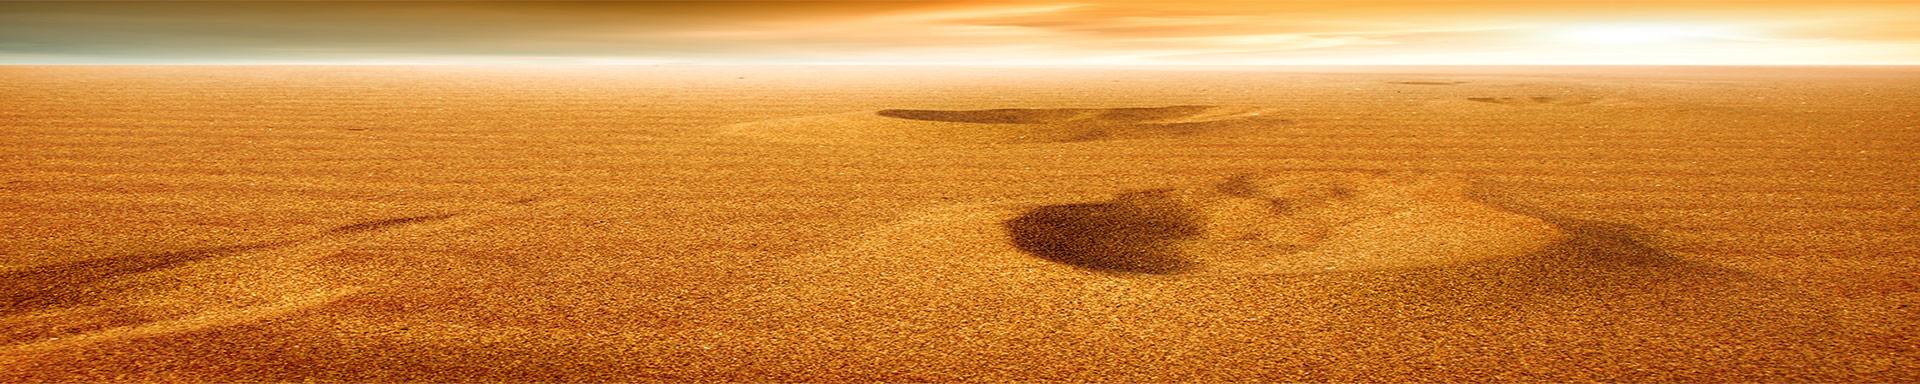 Kirche-Titel-Background-Footprints-Sand